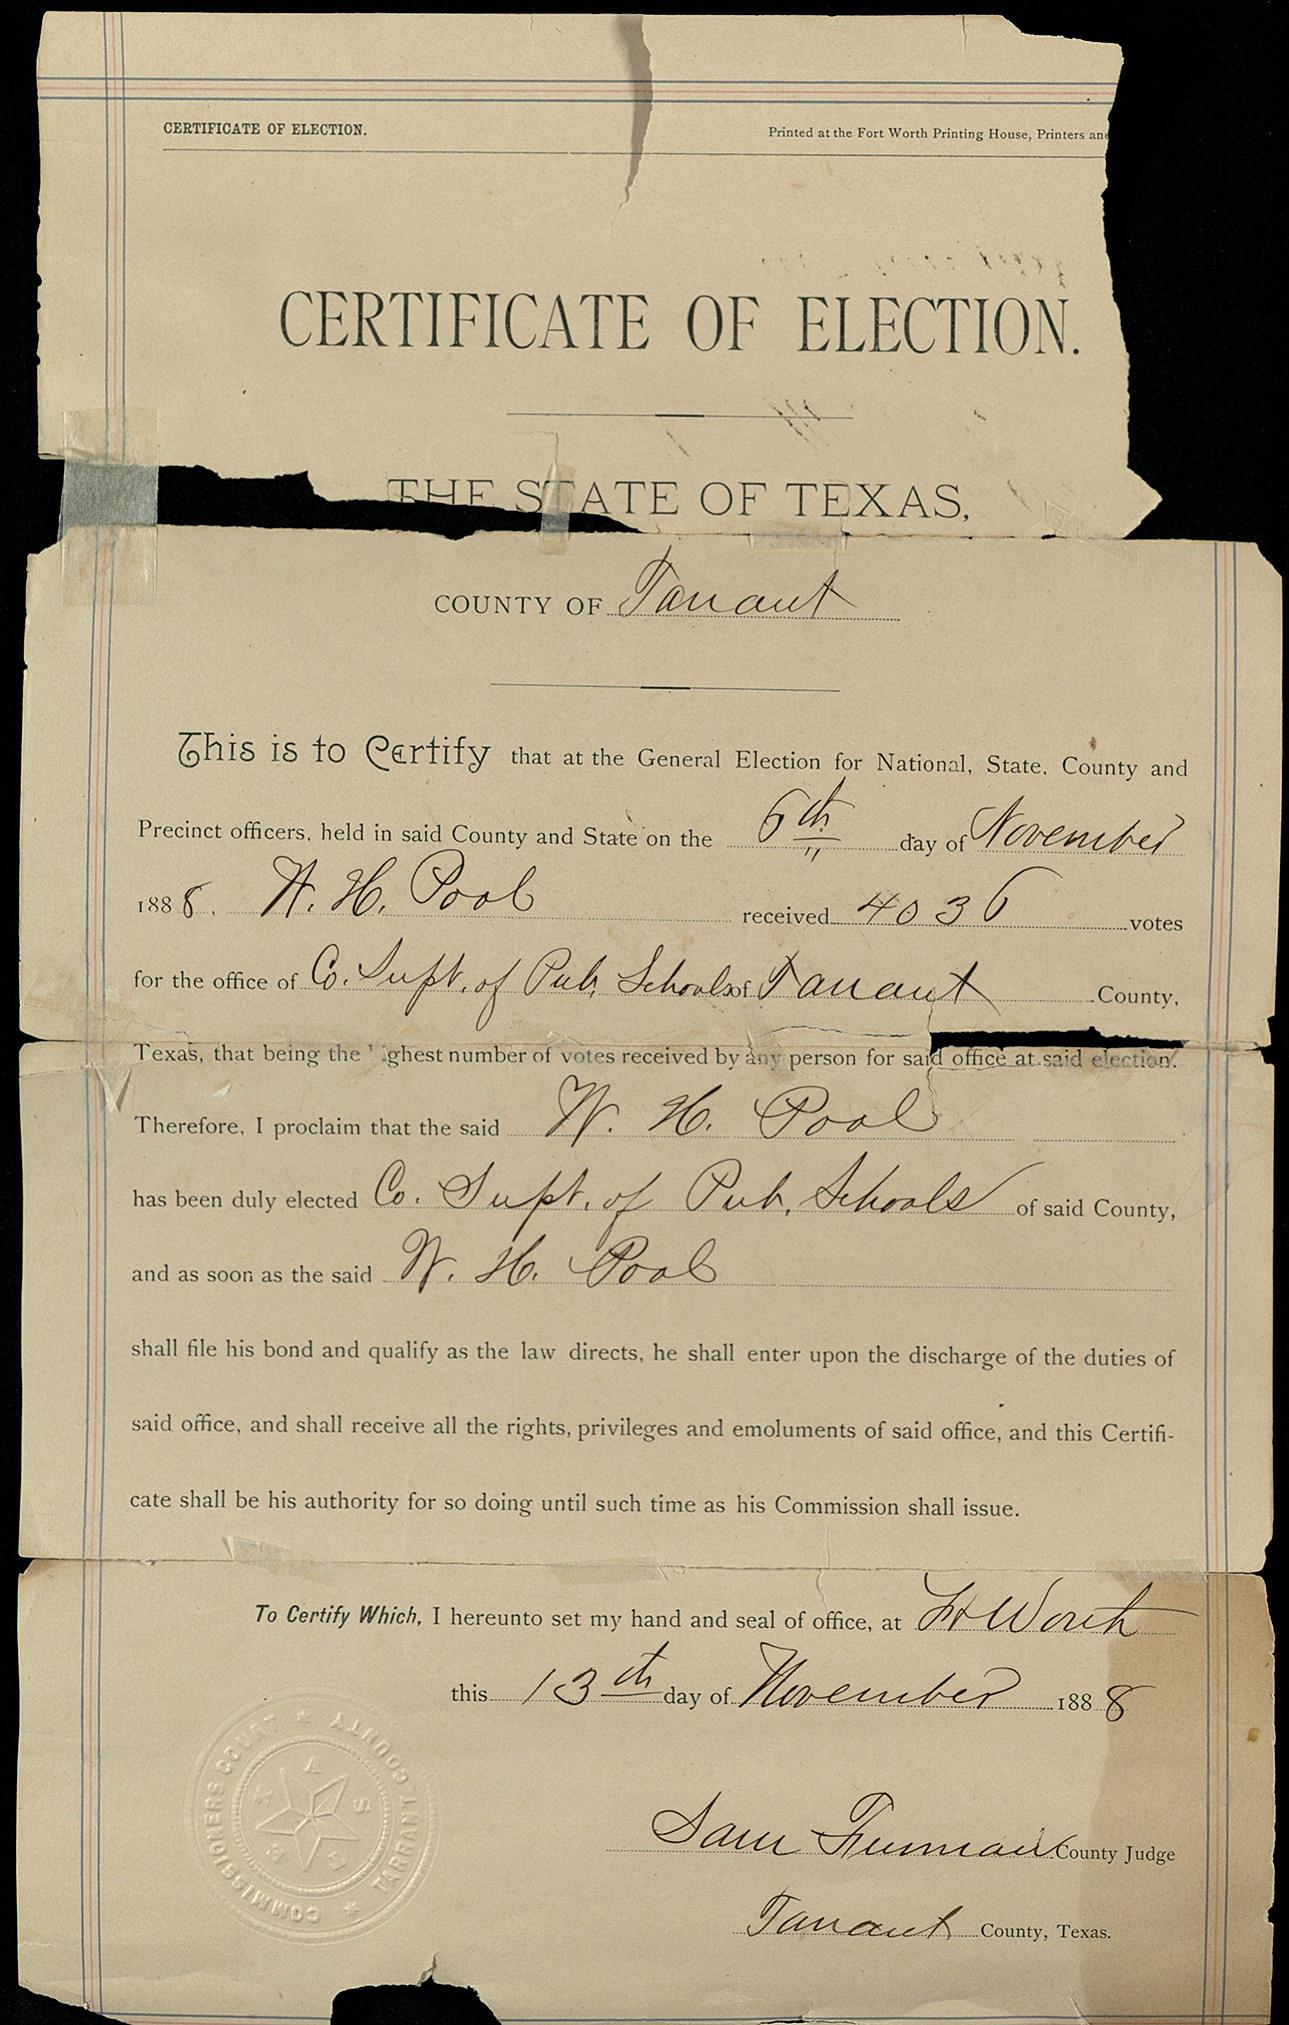 TarrantCountysuperintendentelectioncertificateforWadeHillPool,1888